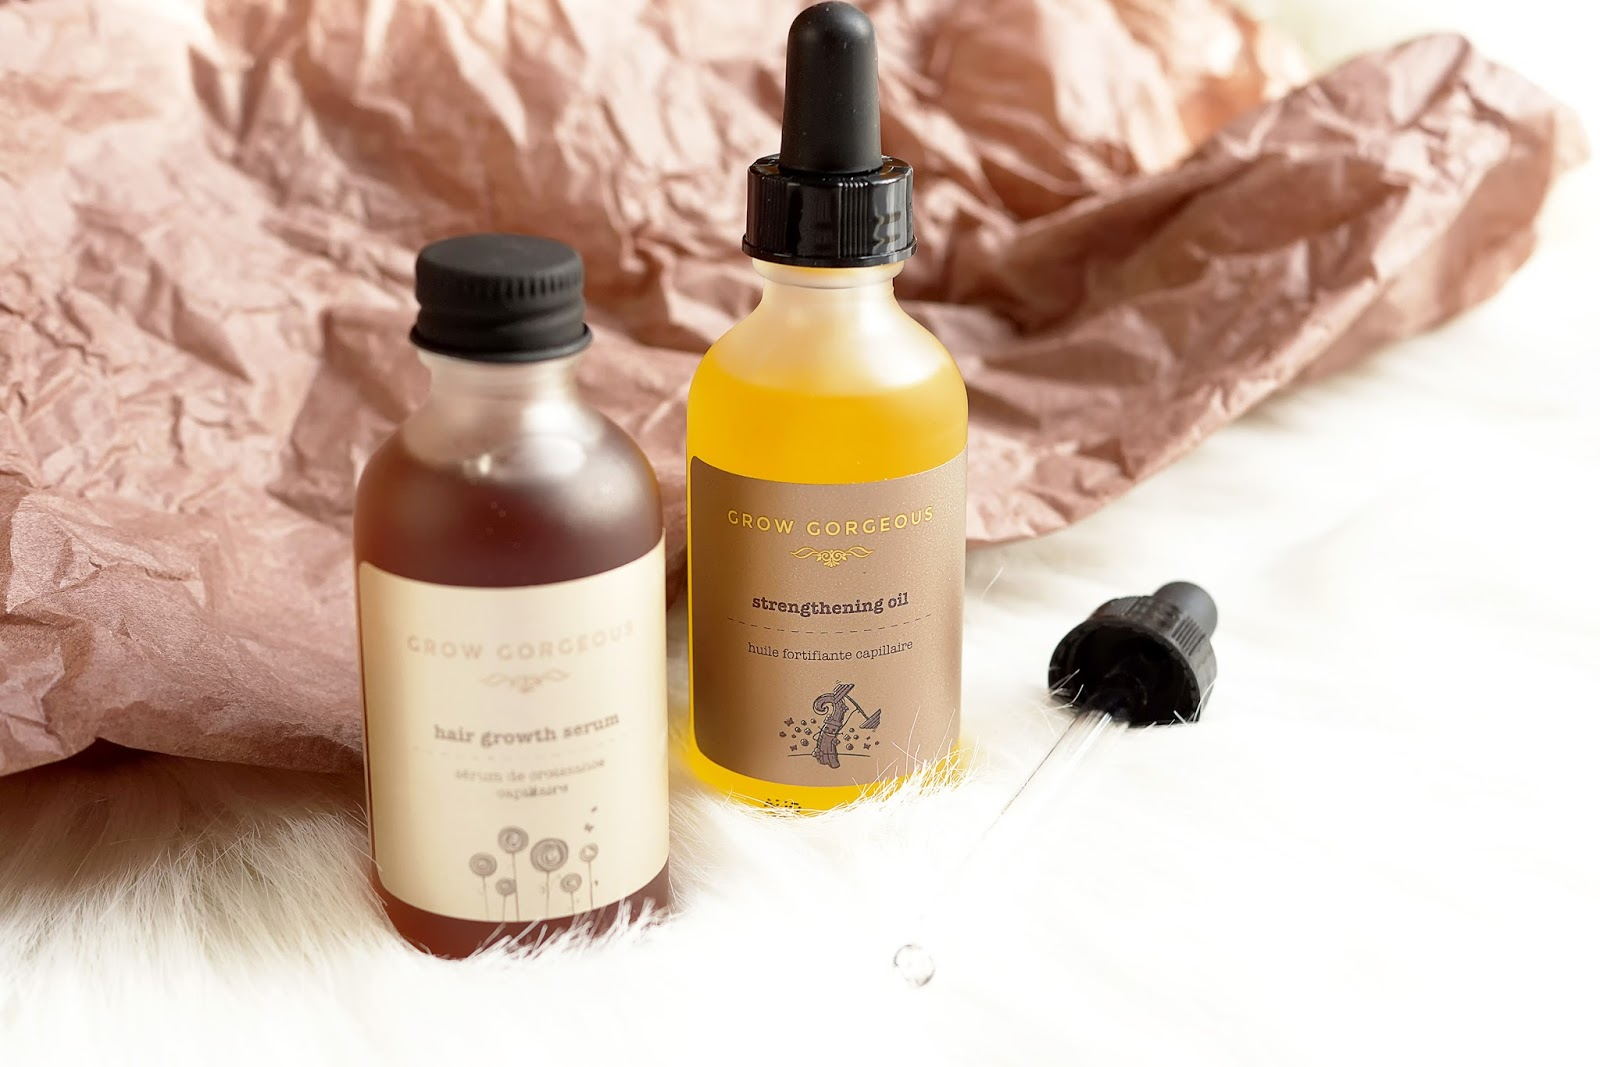 grow-gorgeous-hair-serum-strengthening-oil-review-blog